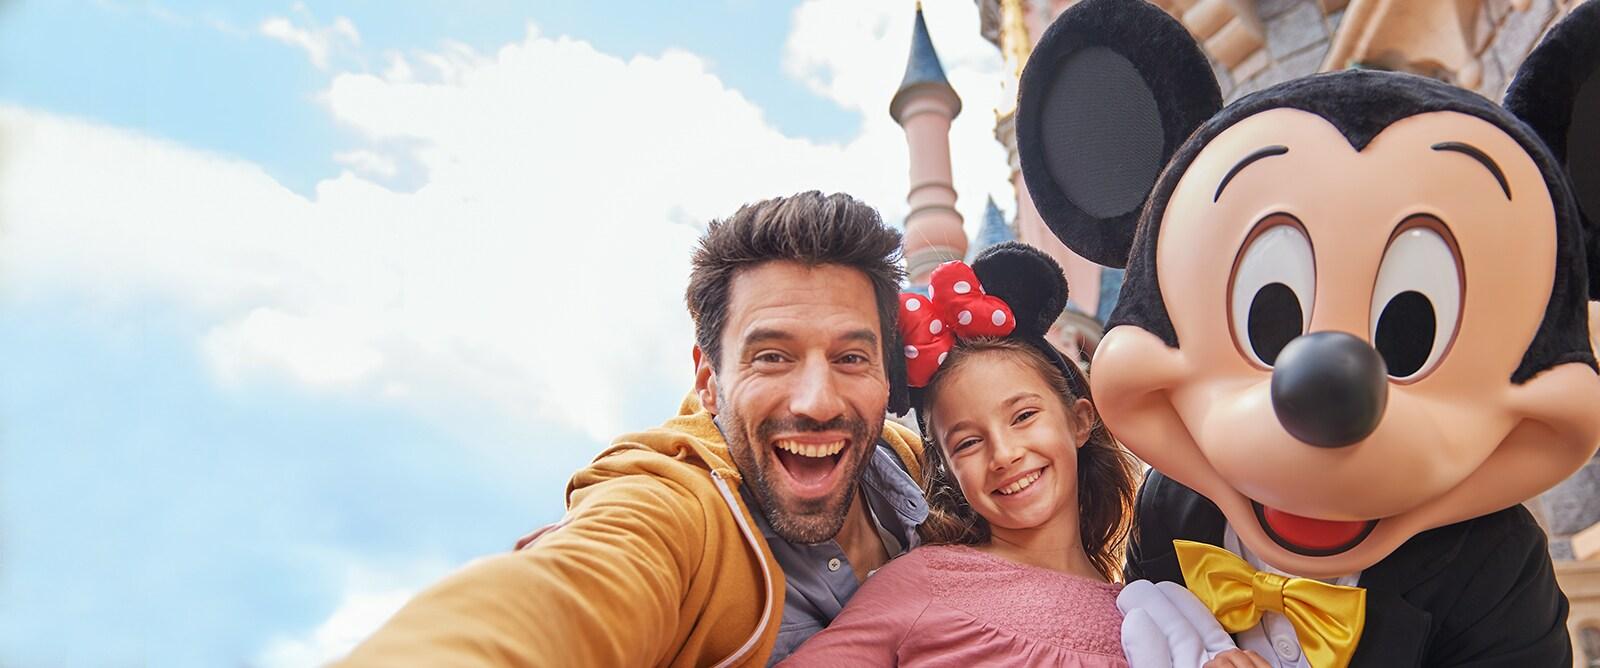 Prenota I Biglietti Per Disneyland Paris